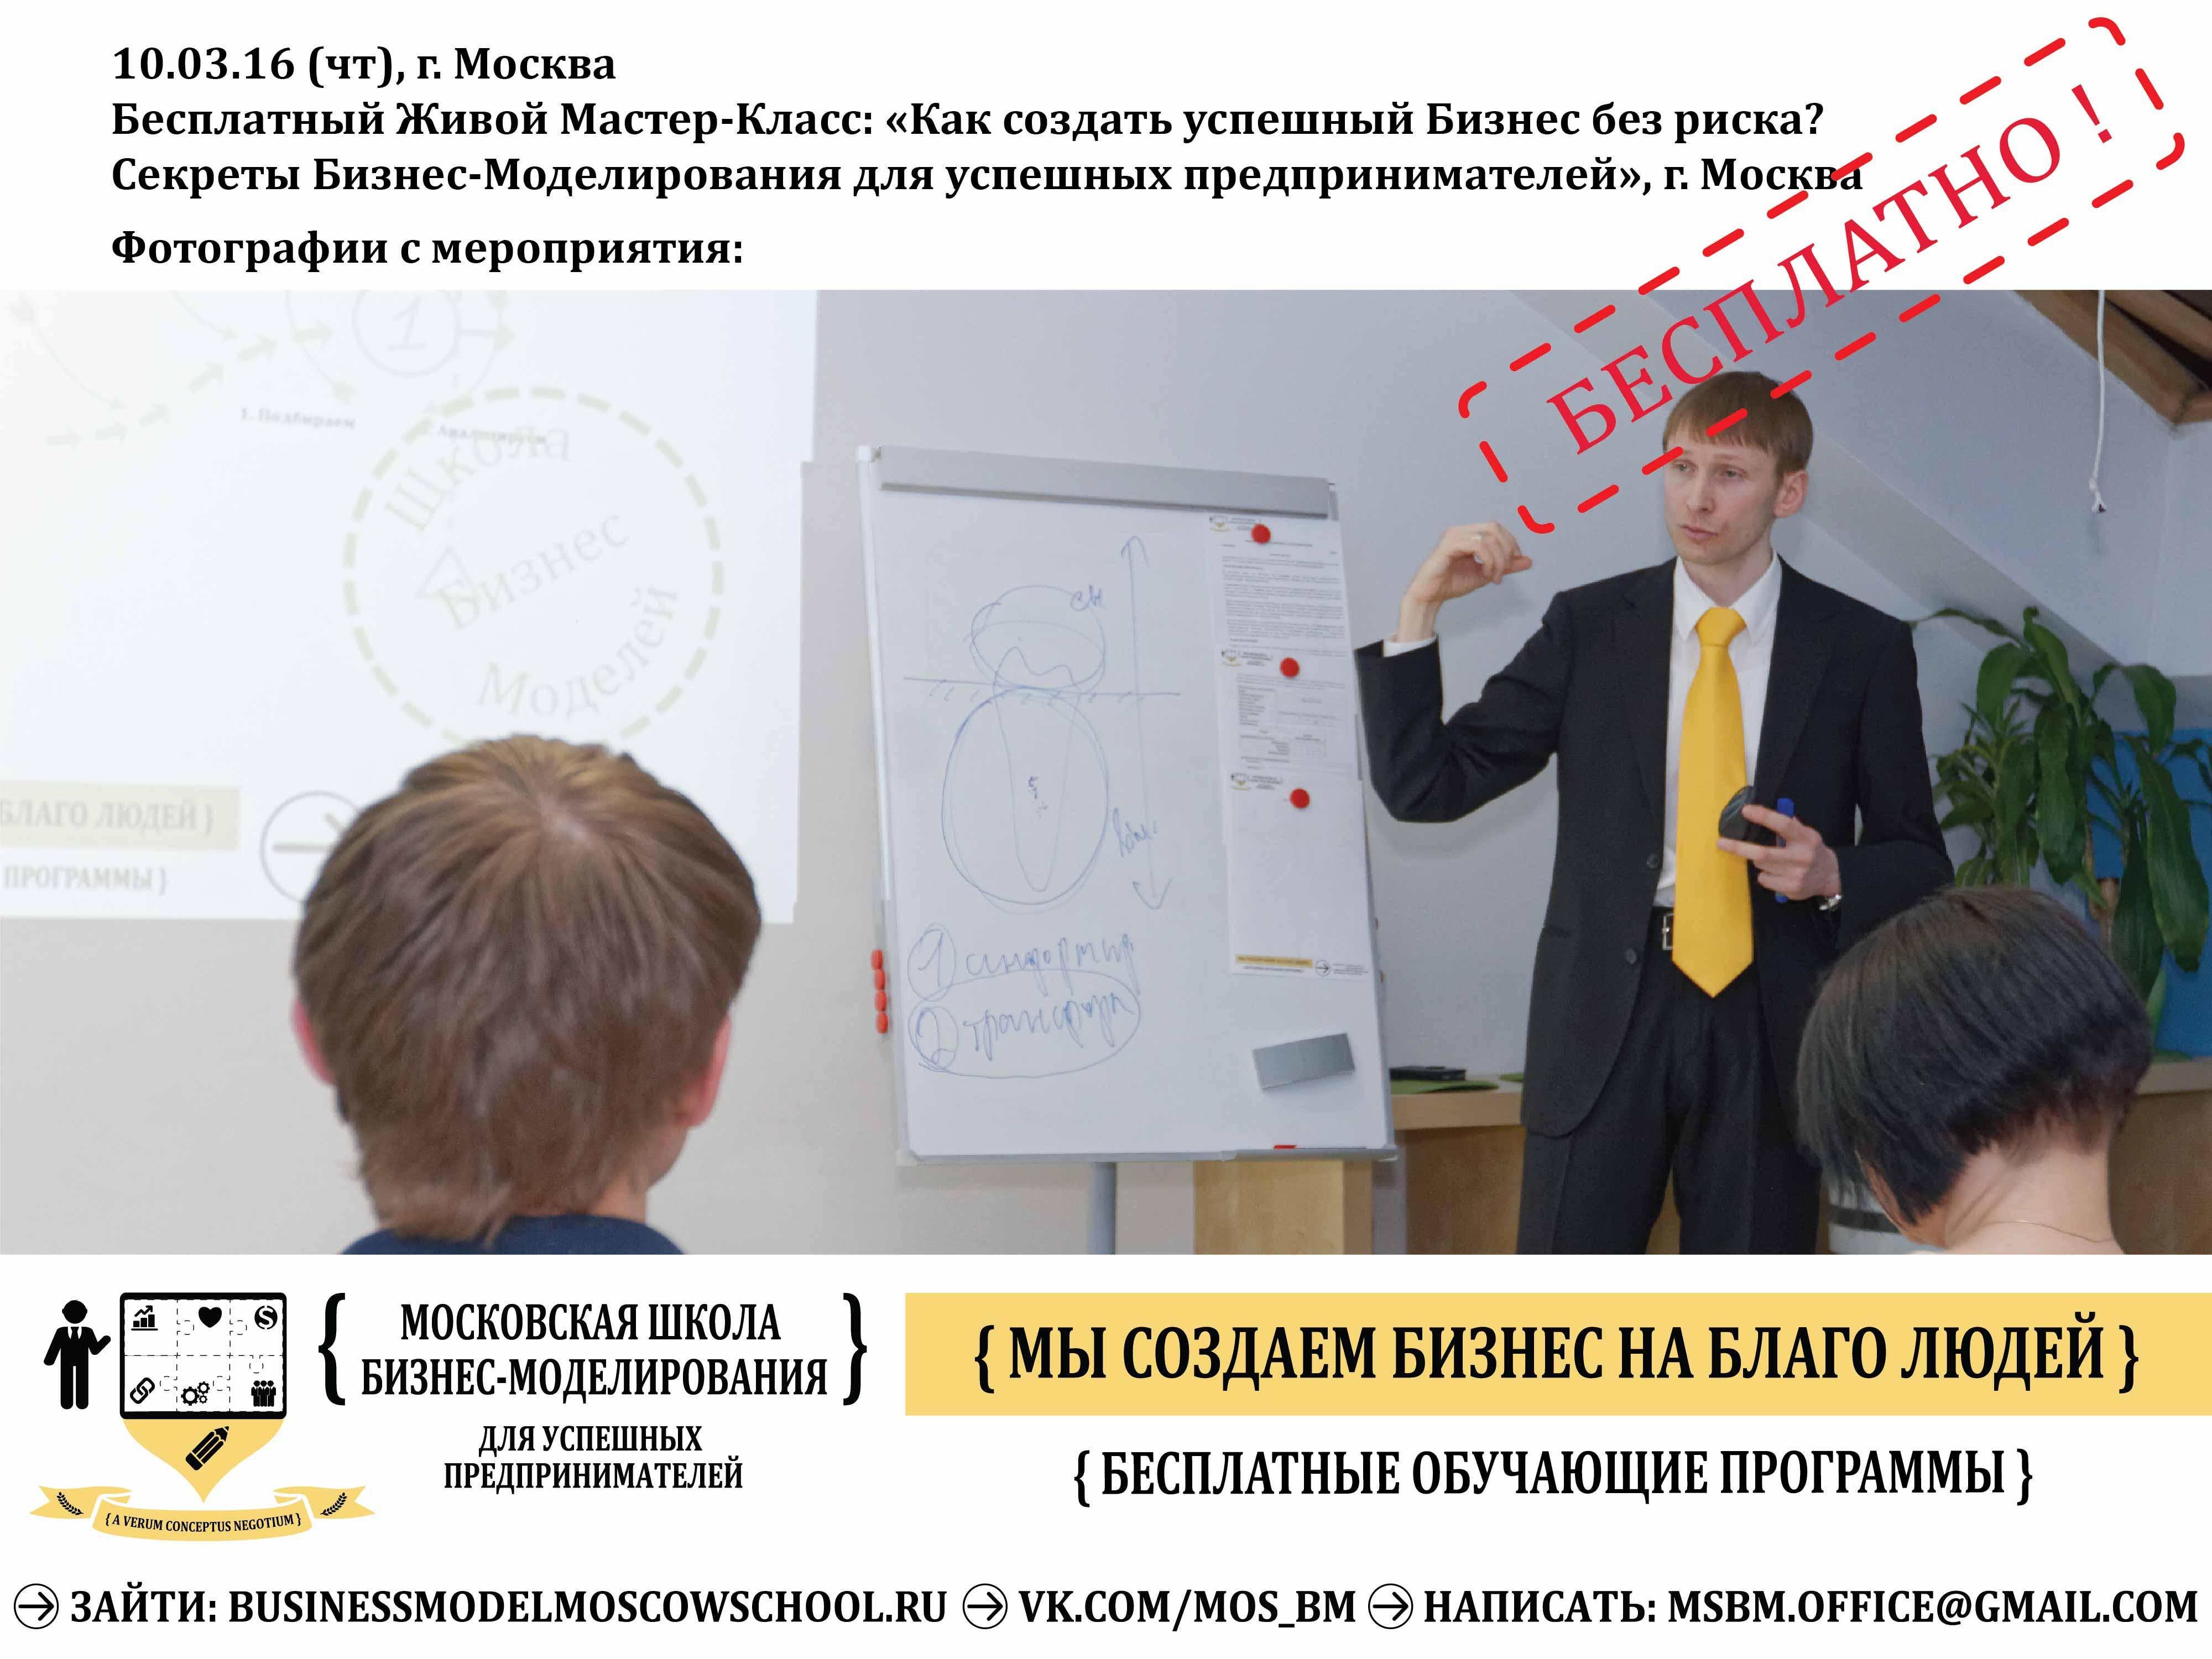 business_model_moscow_school_mclass_photo_10.03.16-2